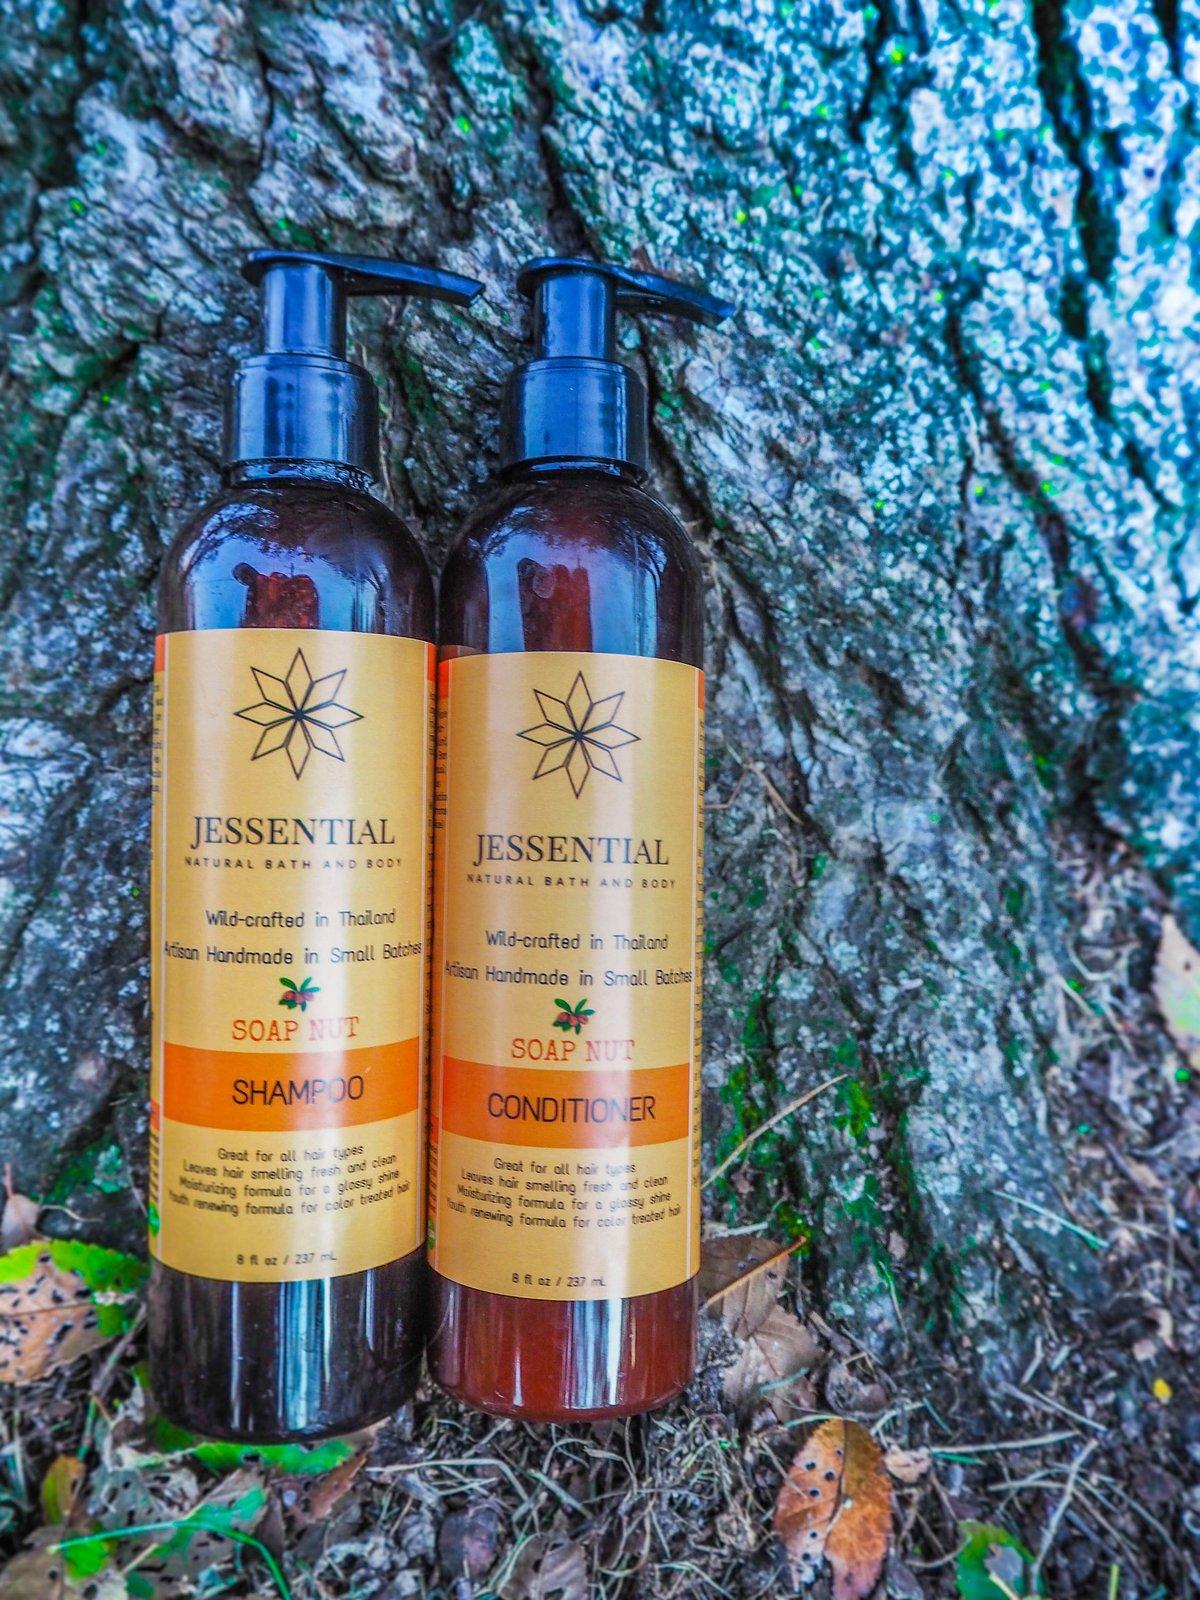 8oz Natural Vegan Shampoo For All Hair Types